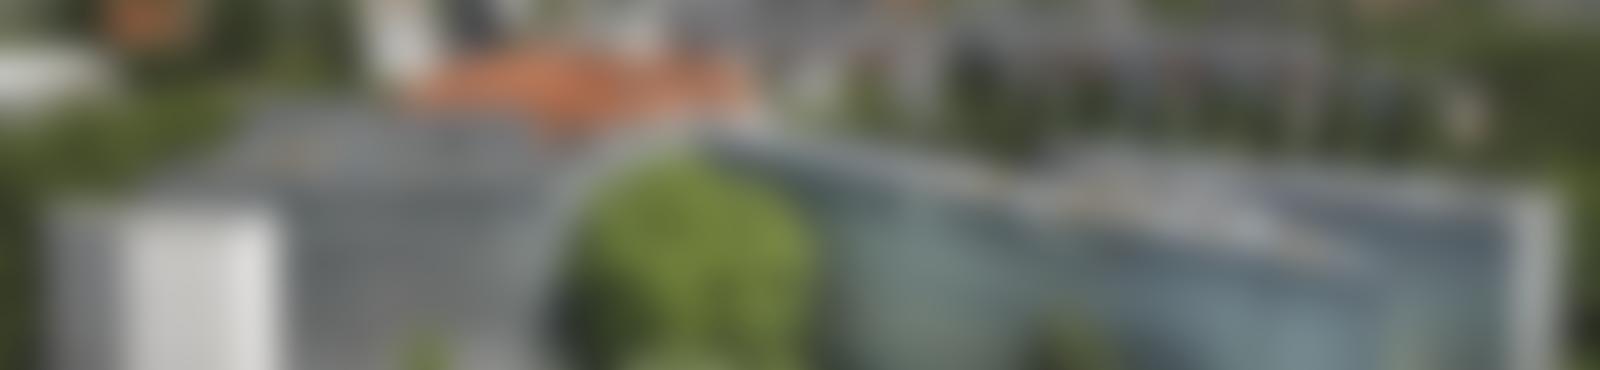 Blurred a58b797a afd5 4d64 a0fe 654ef89db876